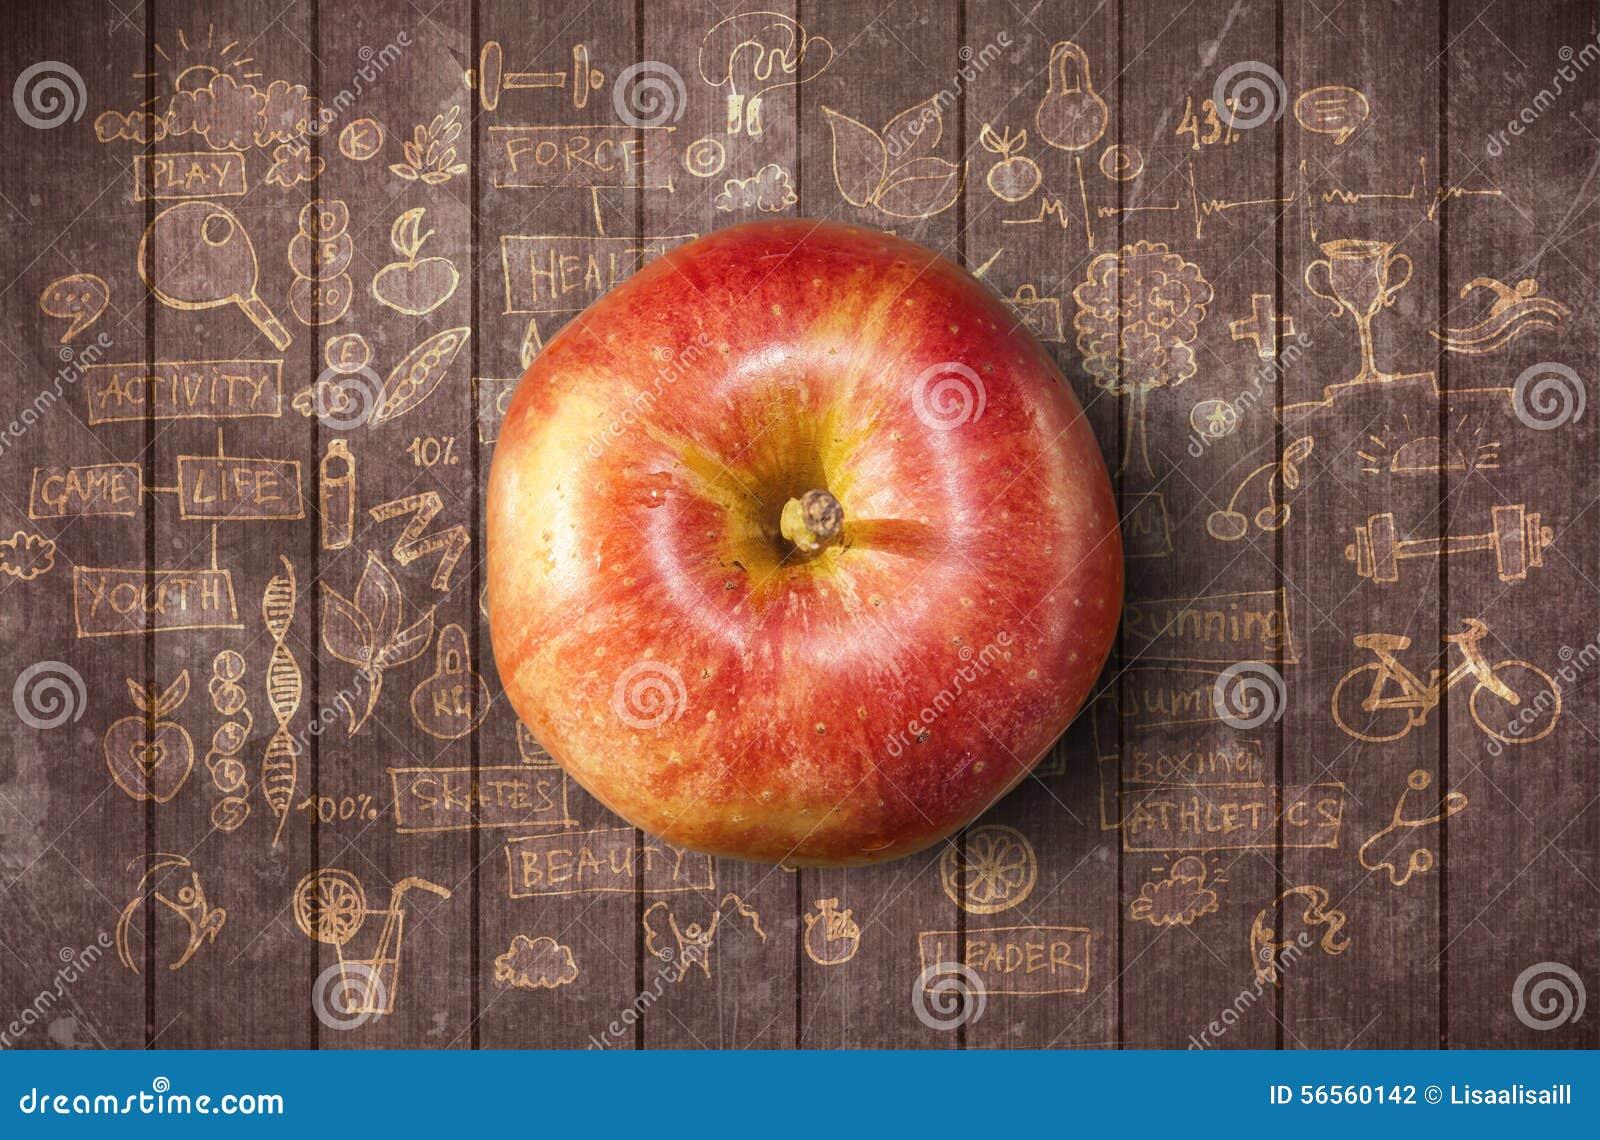 Download Έννοια με το μήλο και Doodles Στοκ Εικόνες - εικόνα από σχέδιο, υγιής: 56560142